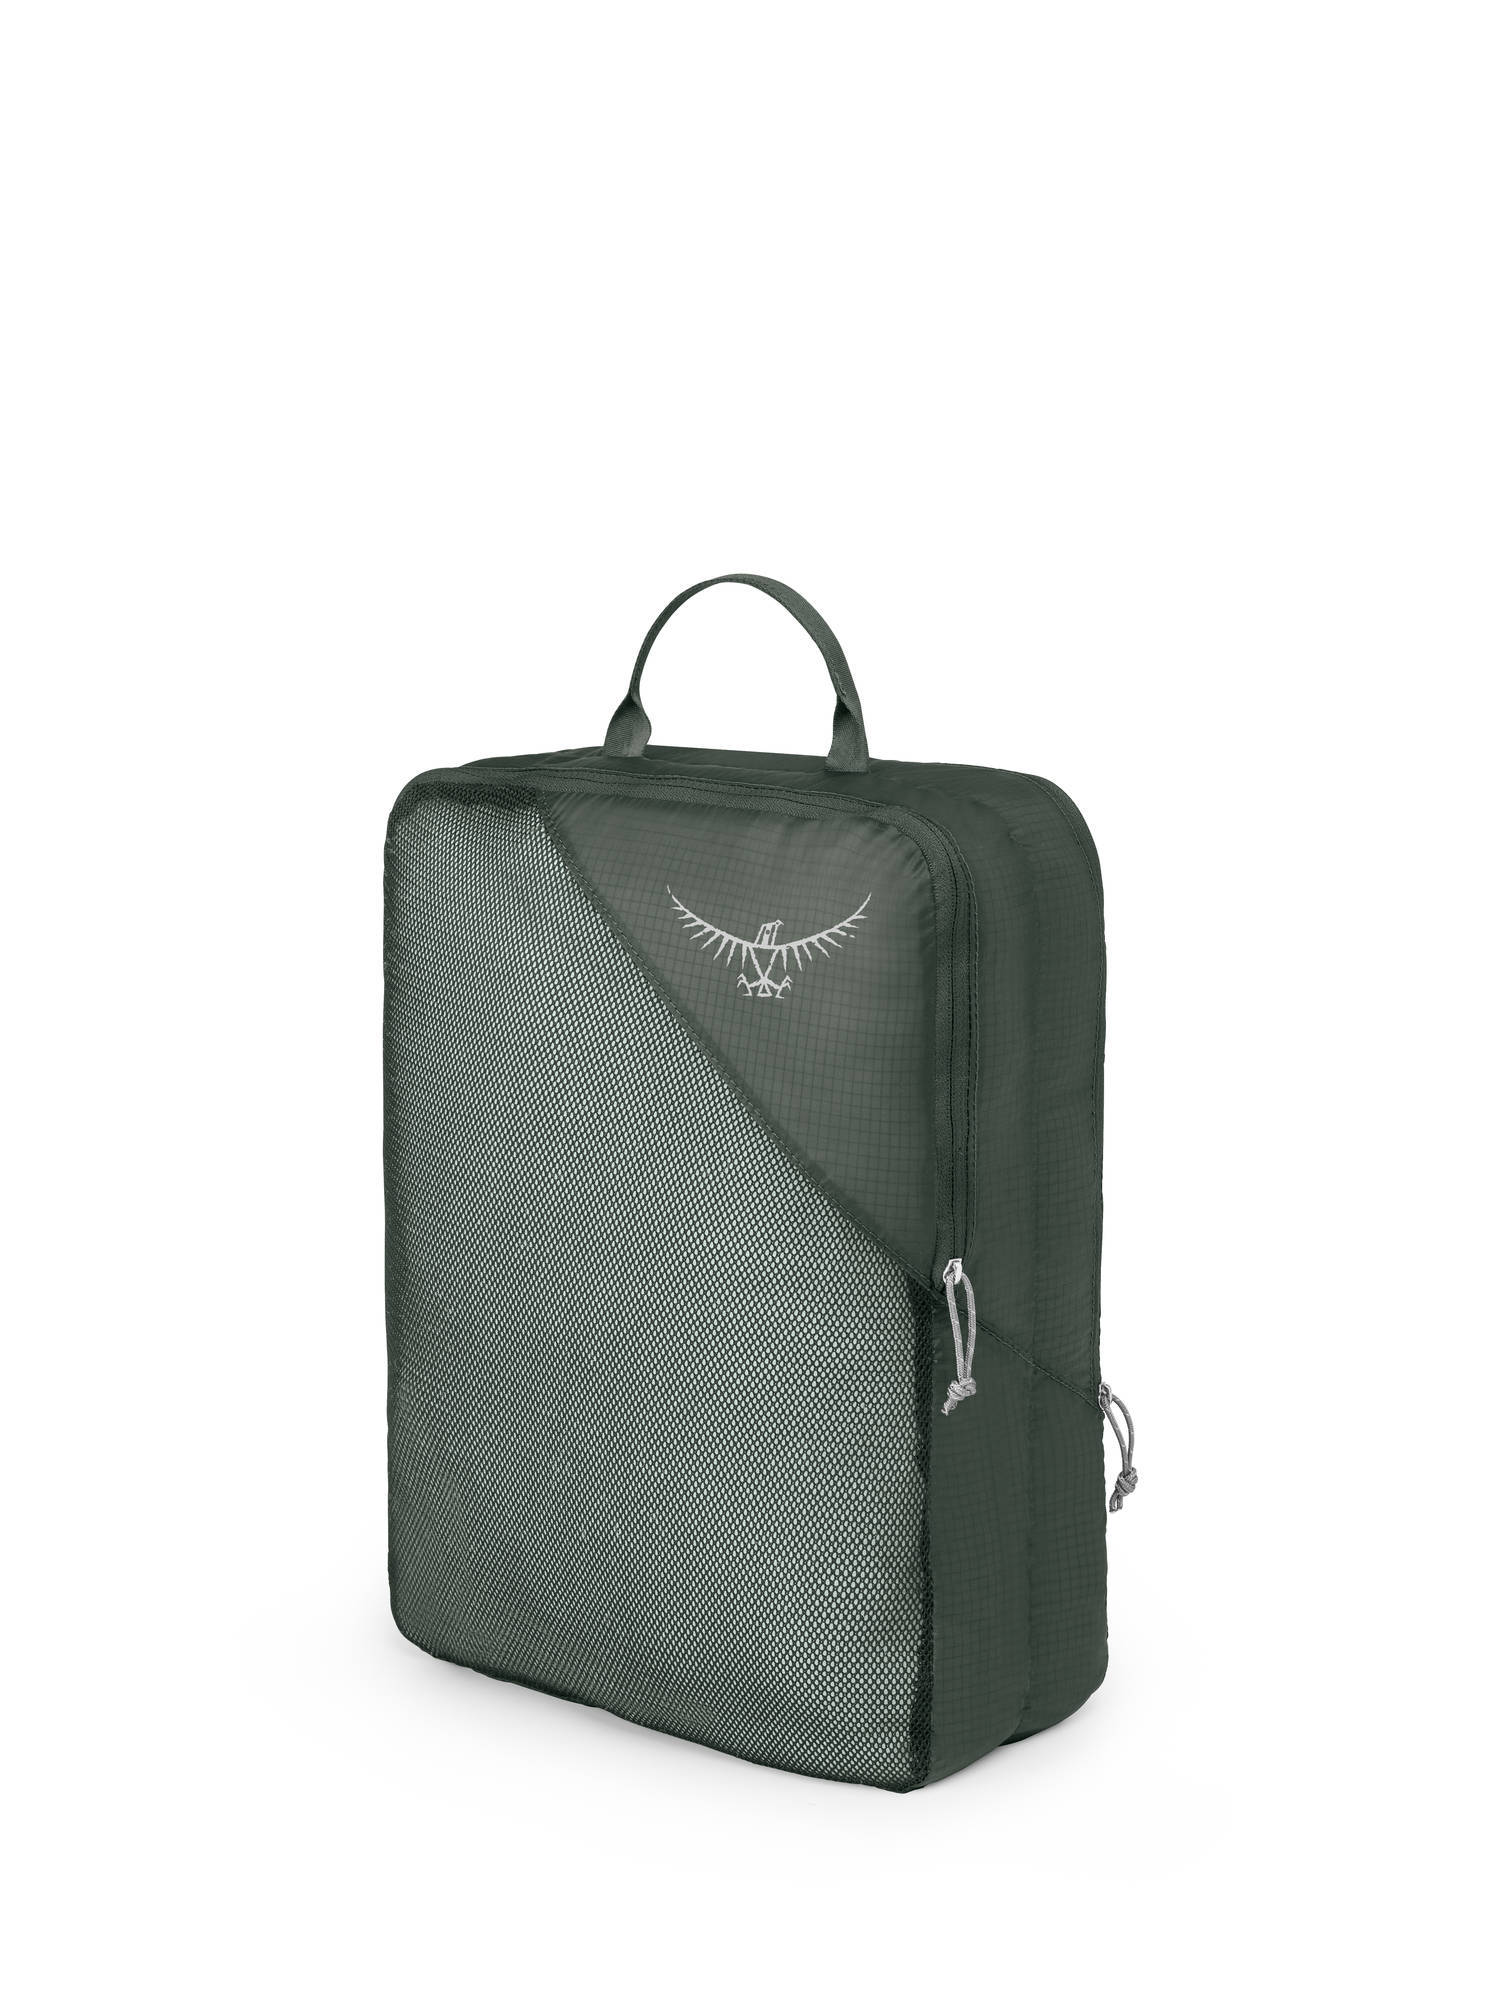 Аксессуары Чехол для одежды Osprey Ultralight Packing Cube Large Shadow Grey UL_Double_Sided_Cube_L_F17_Side_Shadow_Grey_web.jpg